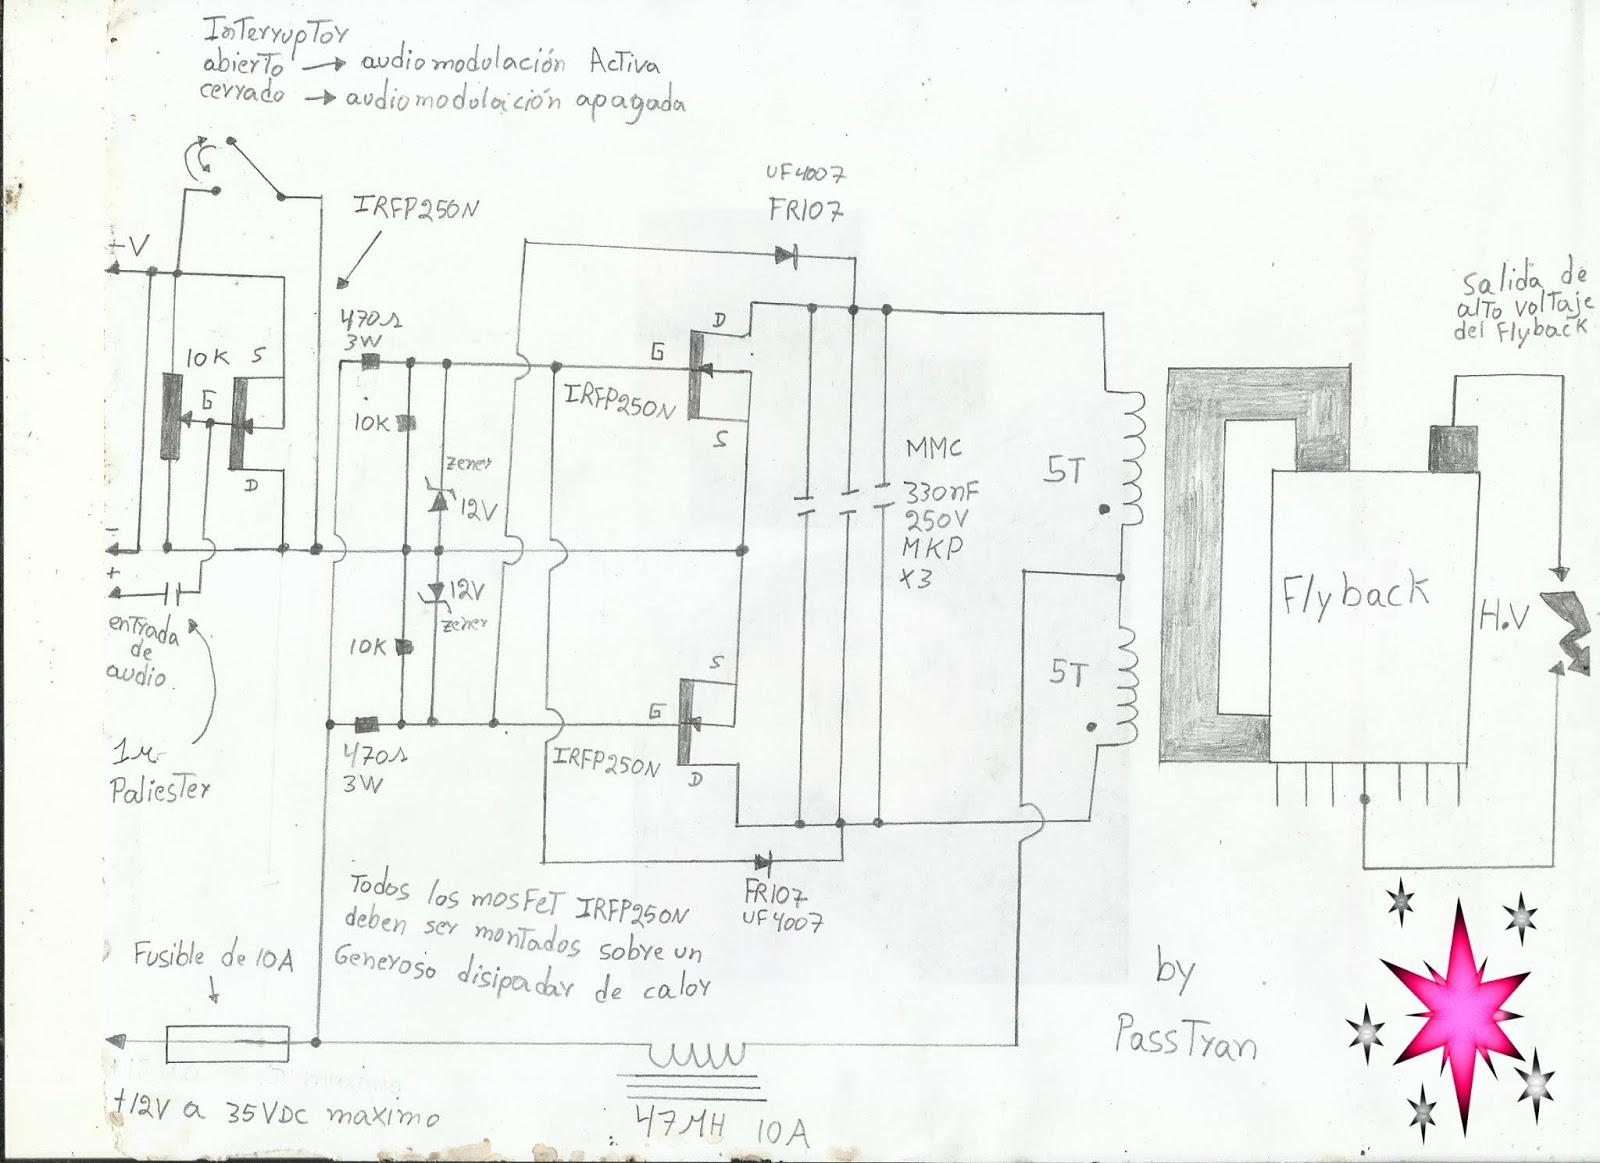 Ponyelectronica : circuito de control para flyback ... on power schematic, nautilus schematic, audio schematic, capacitor schematic,